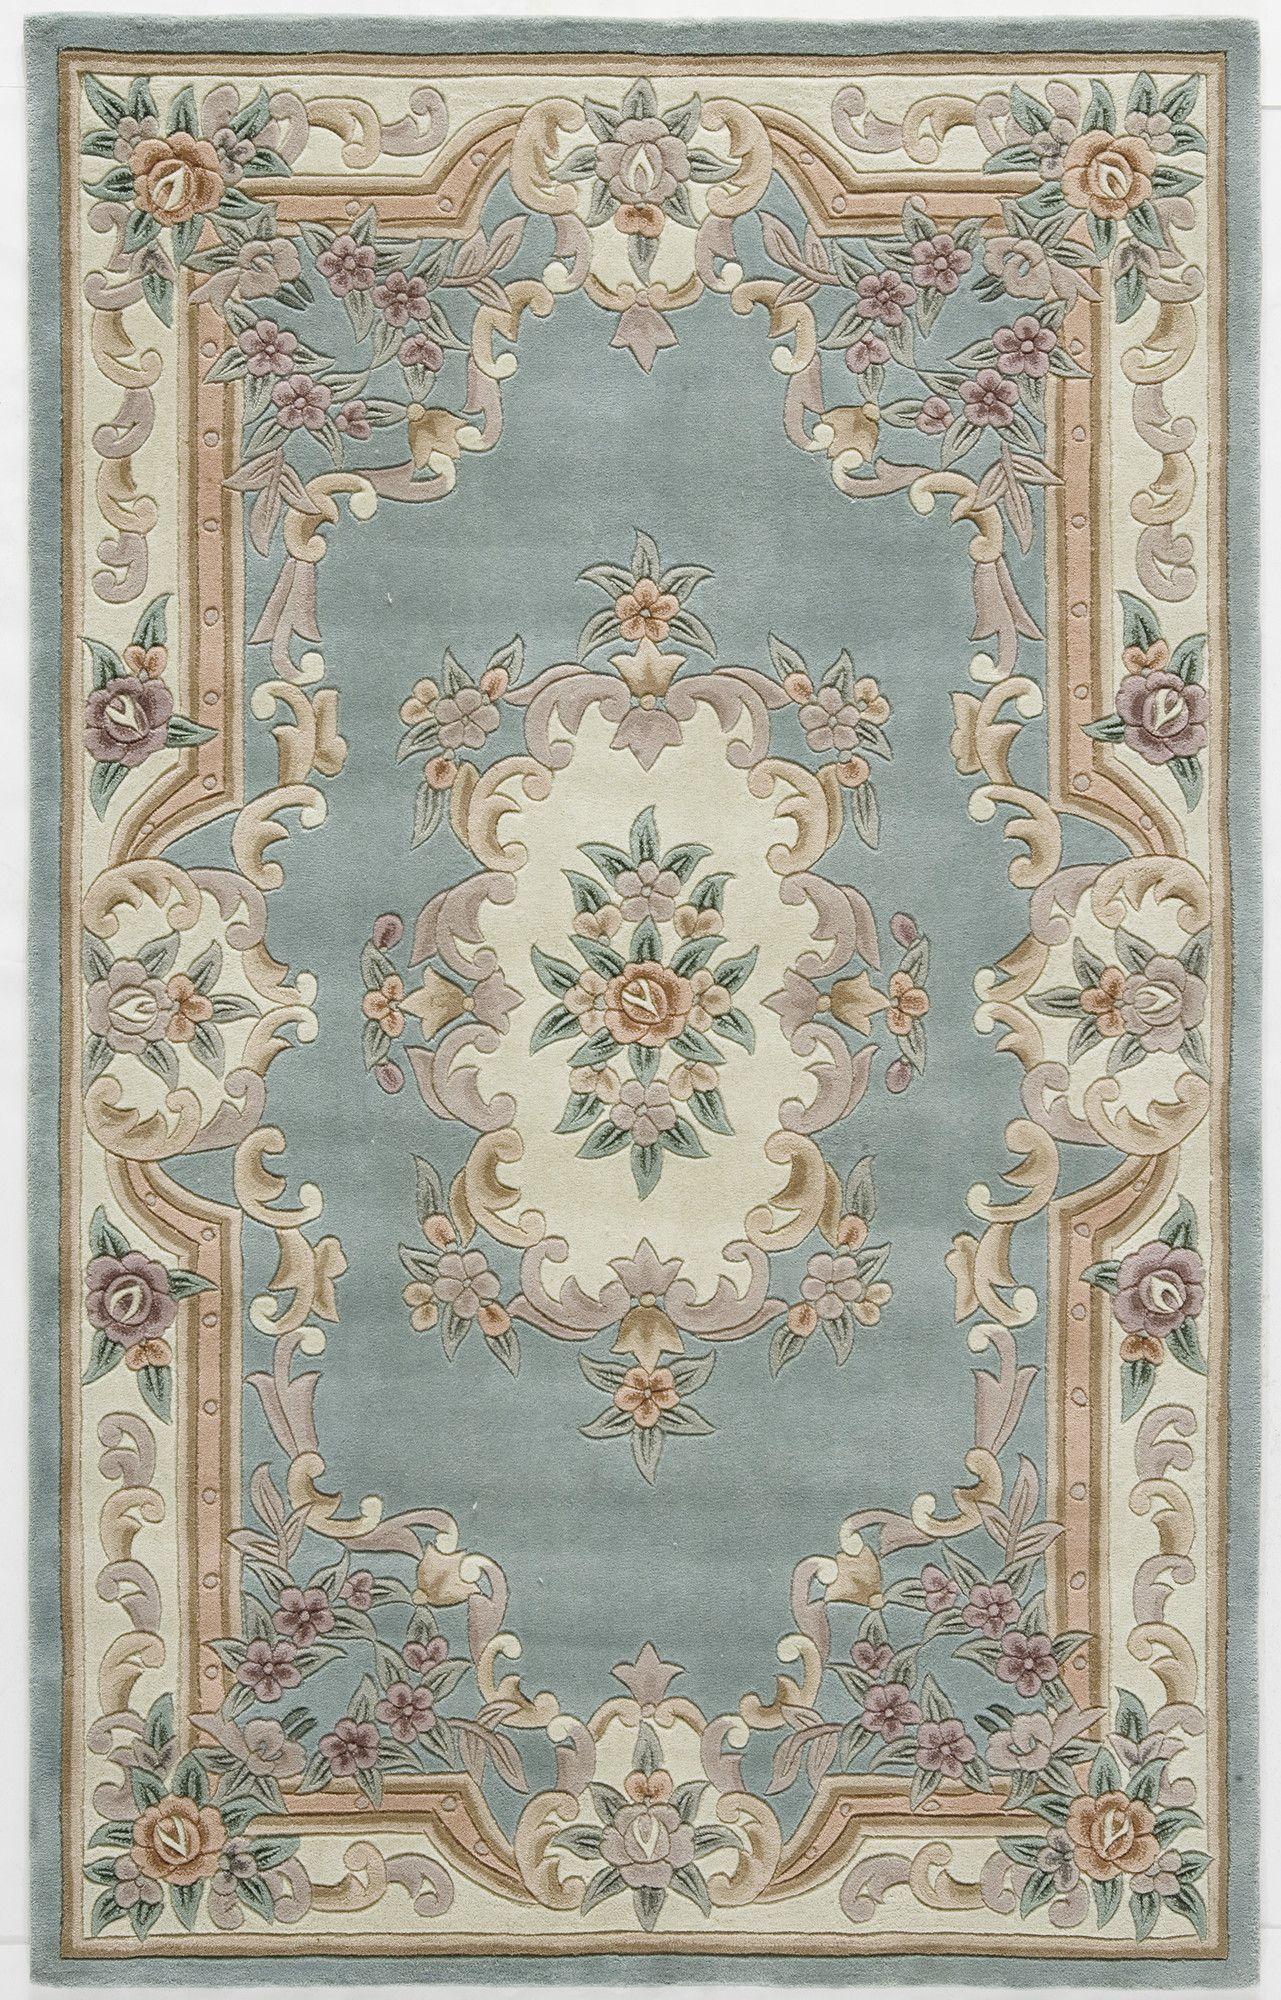 Oriental Handmade Tufted Wool Light Green Area Rug Rugs America Green Area Rugs Light Blue Area Rug